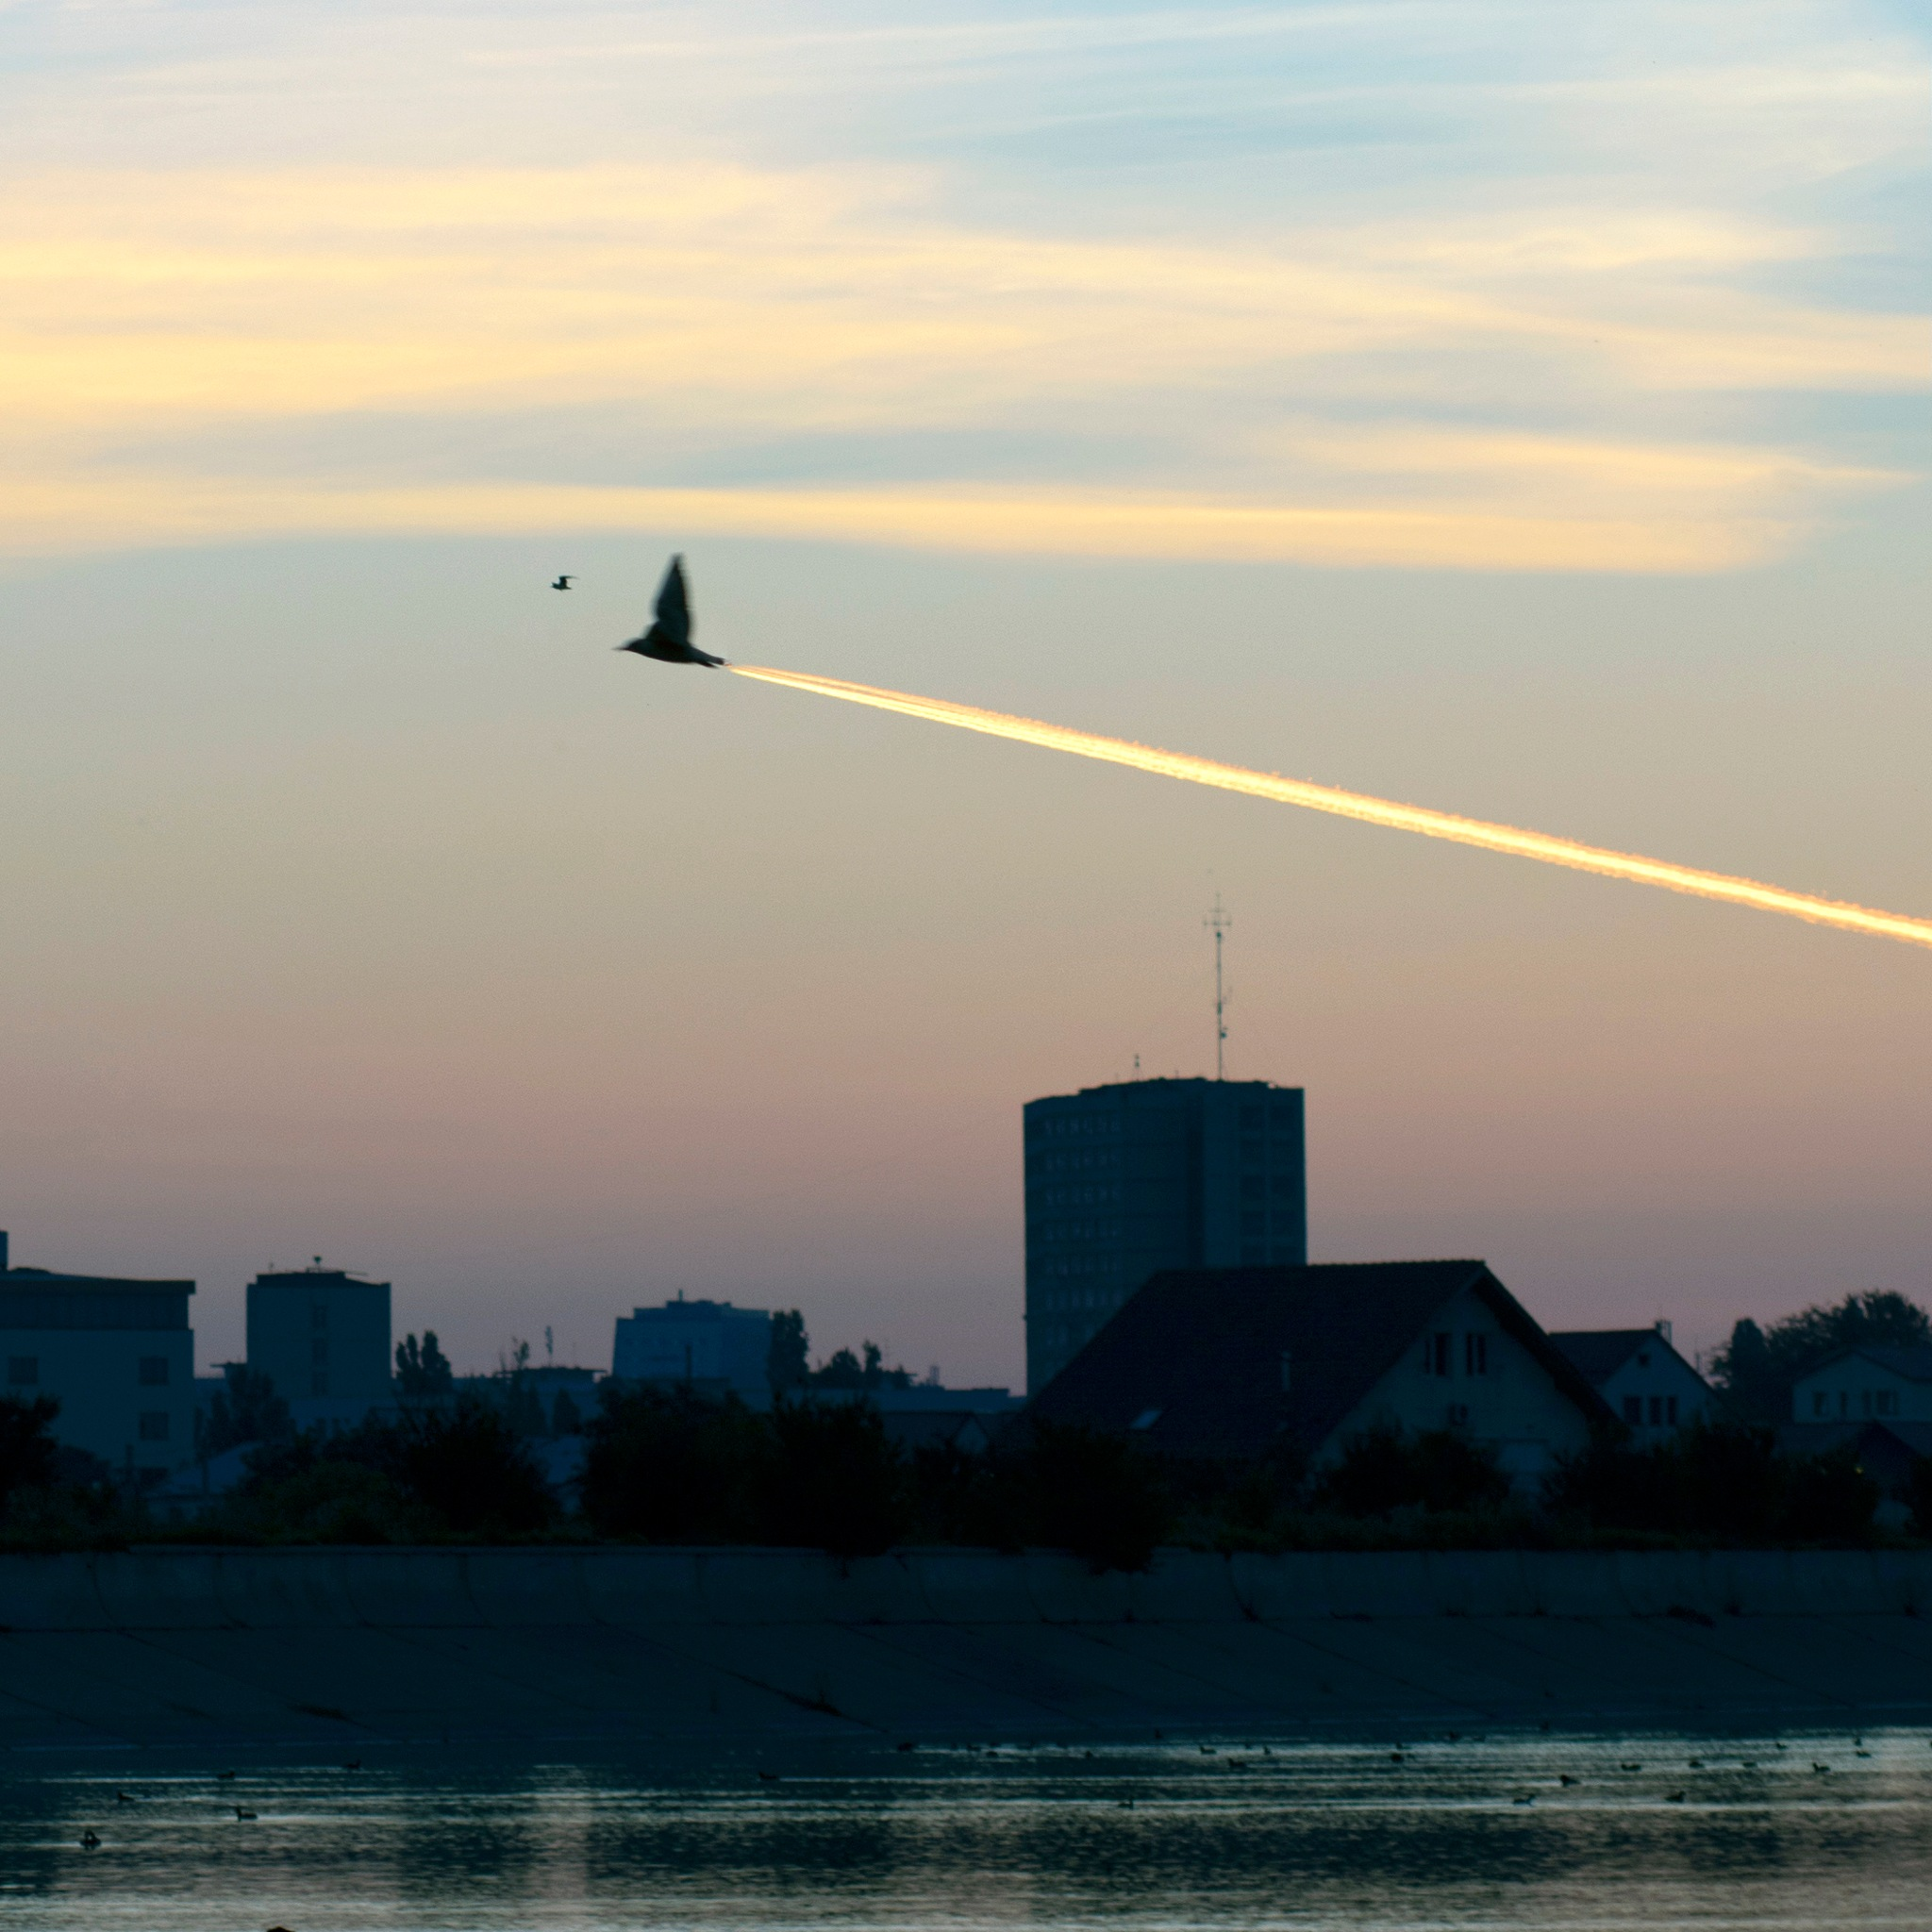 JetBird by Costy Pirvu